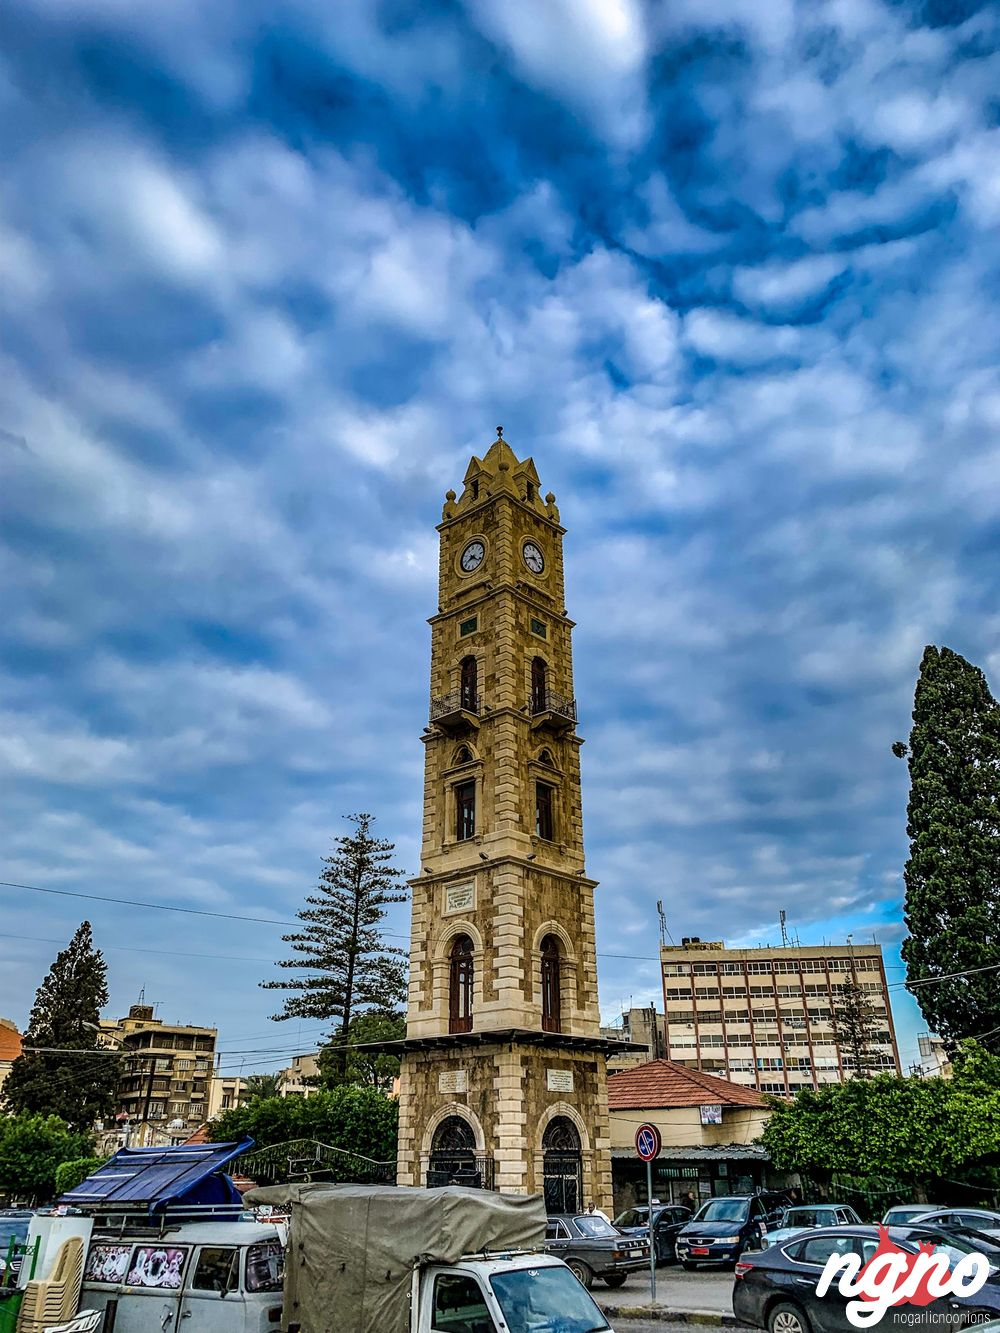 tripoli-lebanon-nogarlicnoonions-2422019-01-13-08-17-29